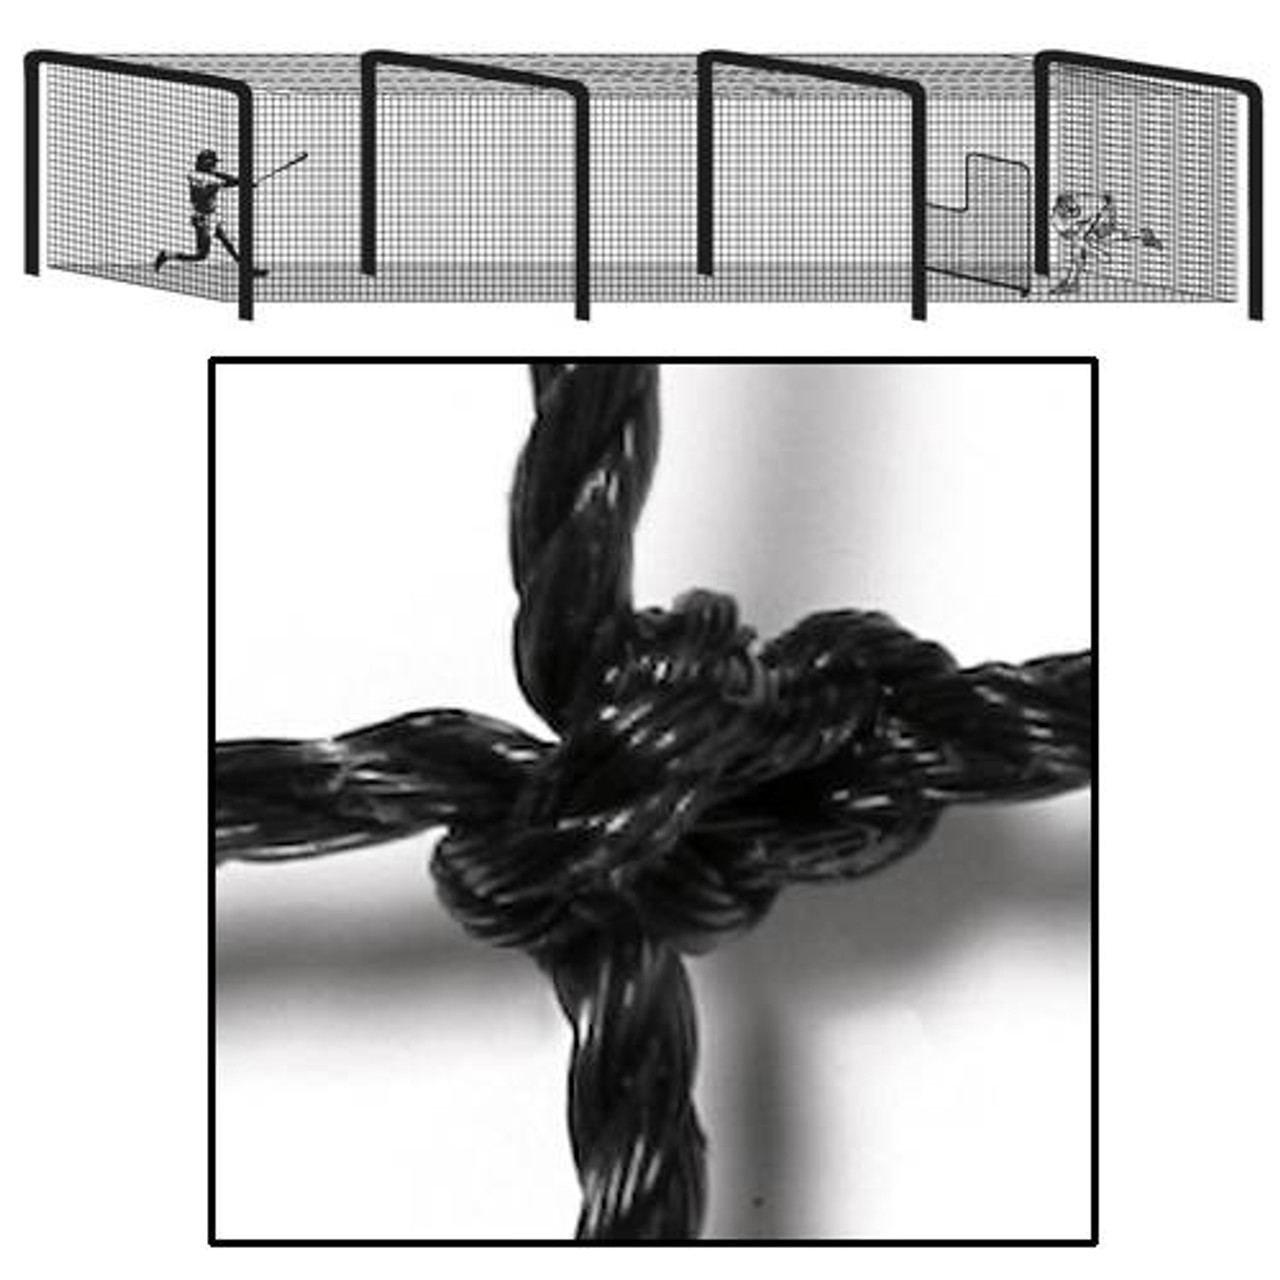 Baeball Varsity Batting Tunnel Net 55 x 14 x 12